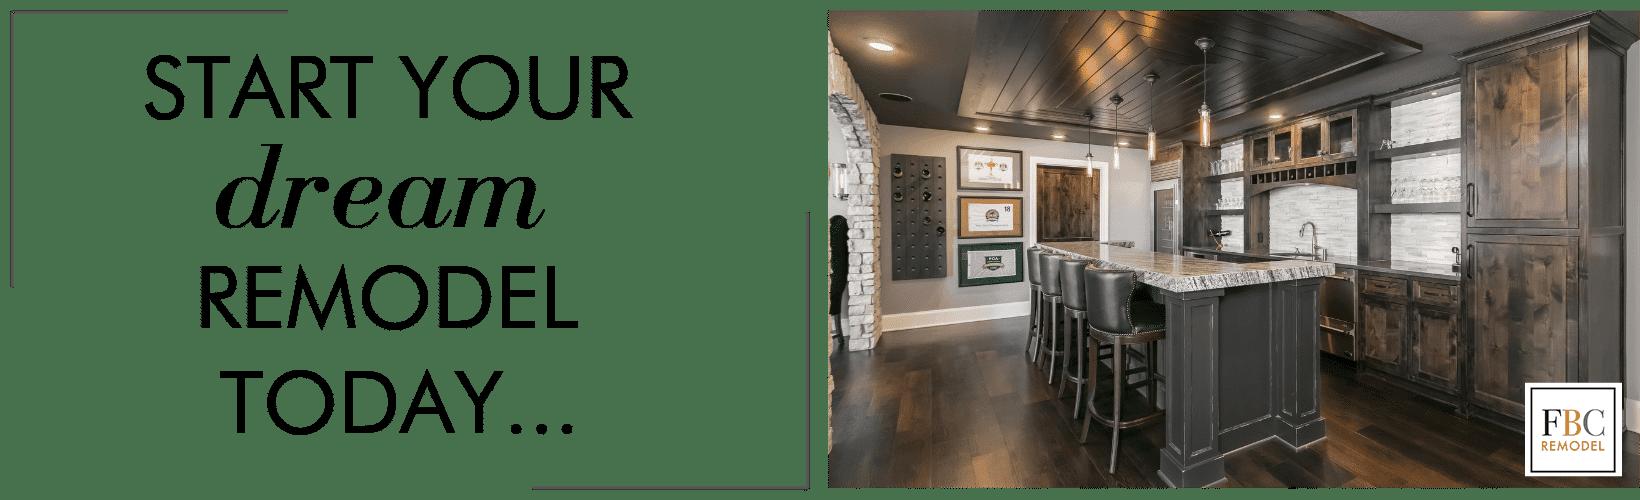 basement remodel   fbc remodel